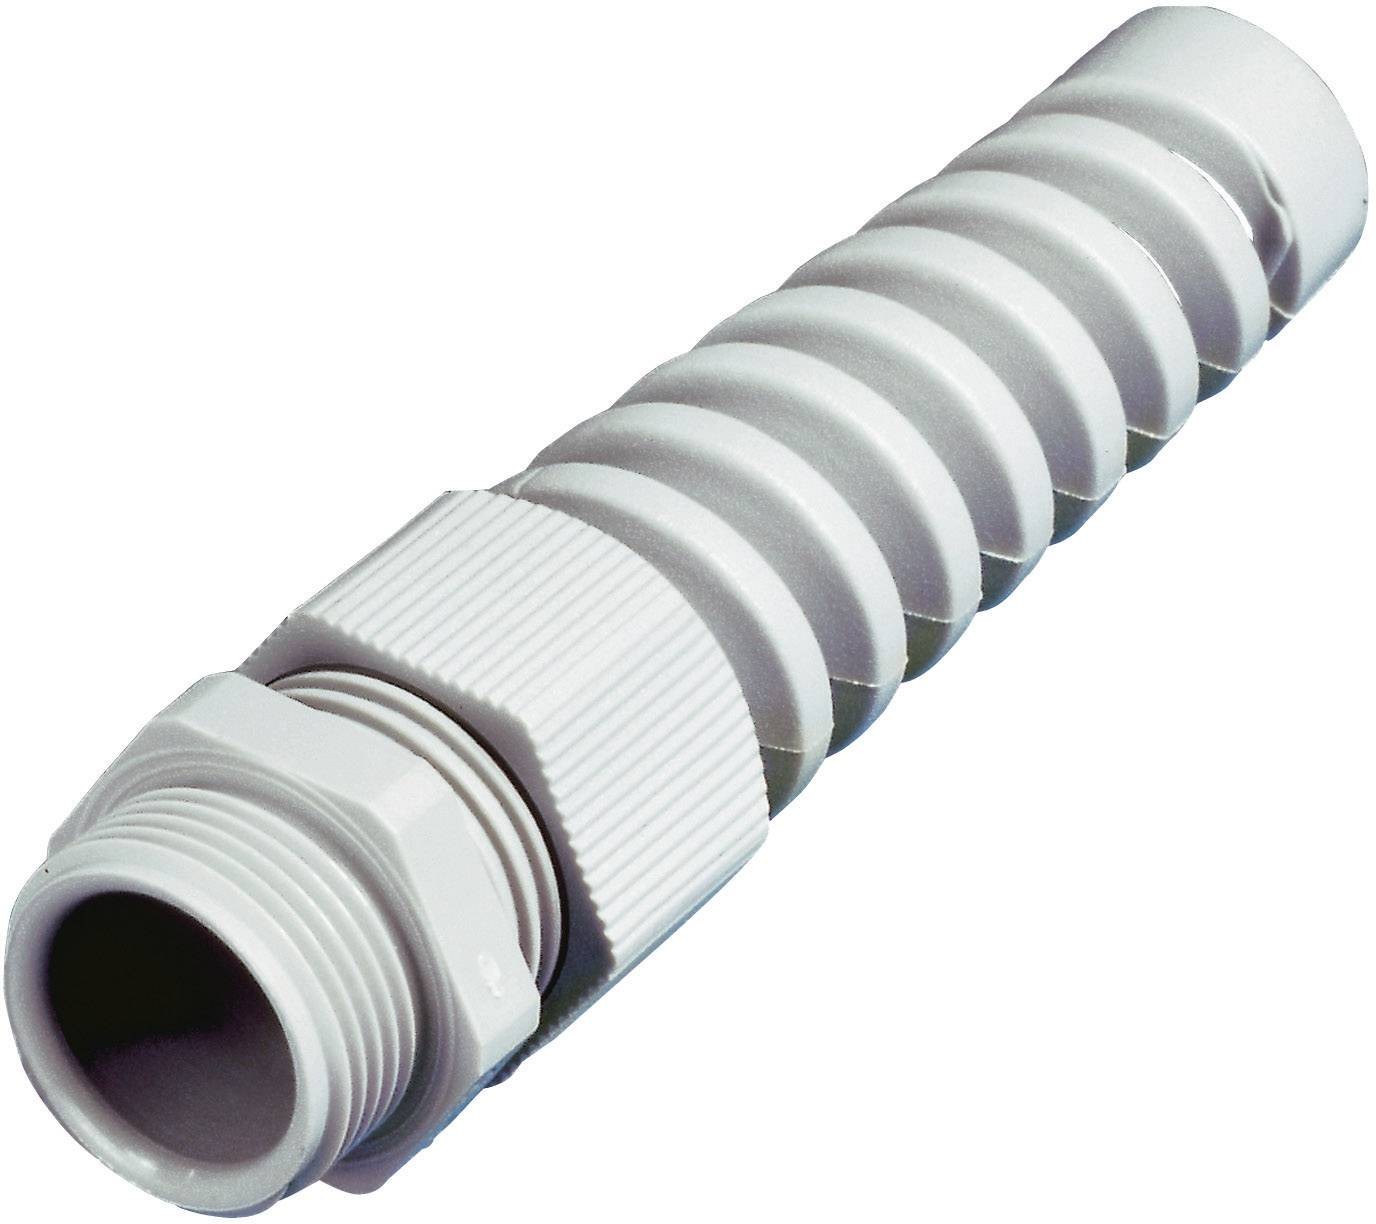 Káblová priechodka Wiska ESKVS M25 RAL 9005, polyamid, čierna, 1 ks